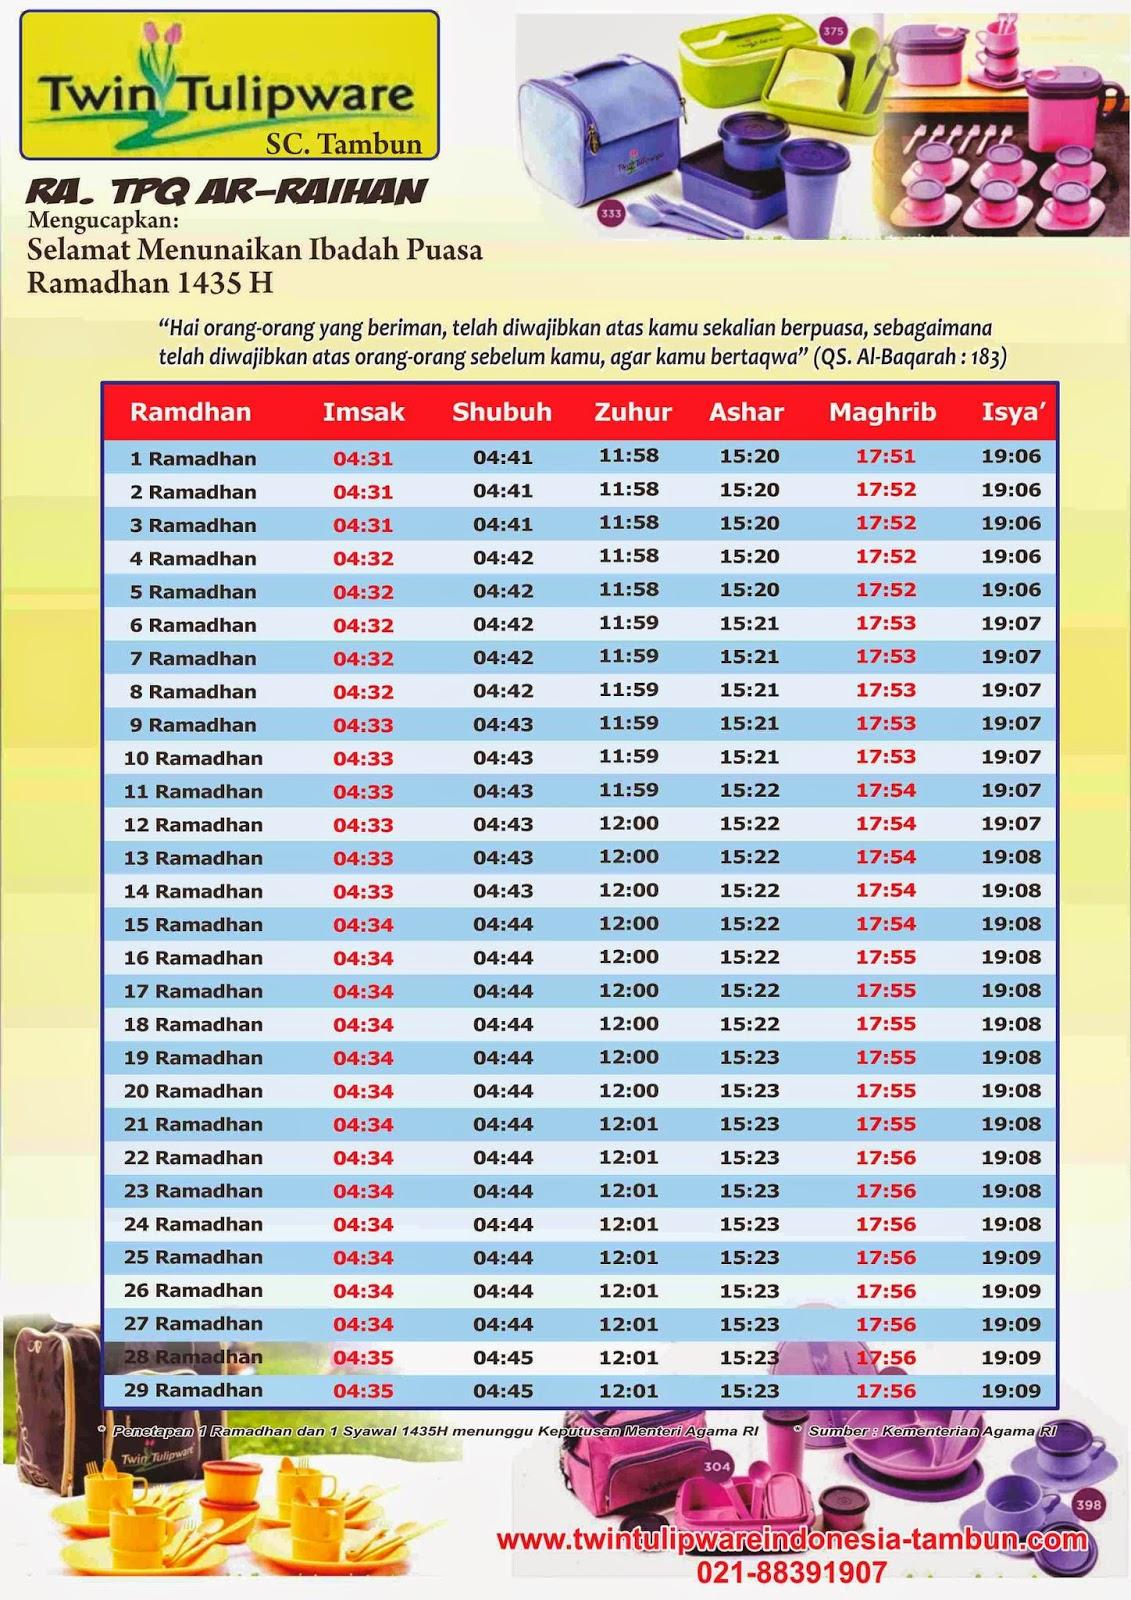 Jadwal Imsakiyah Ramadhan 1435 Hijriyah 2014 Edisi Twin Tulipware